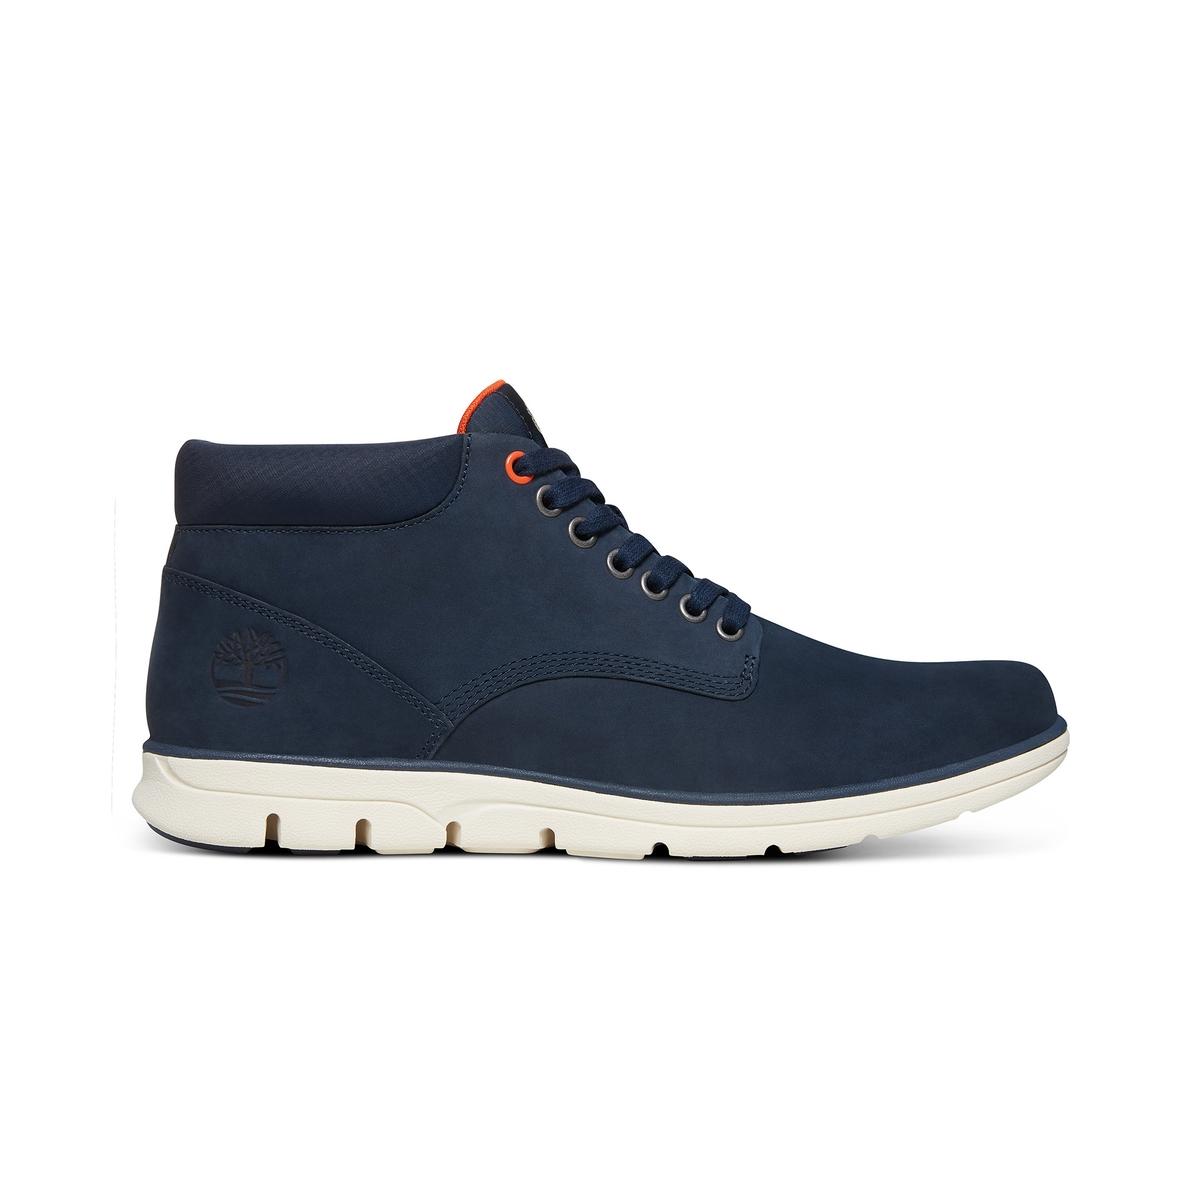 Boots Bradstreet Chukka LE